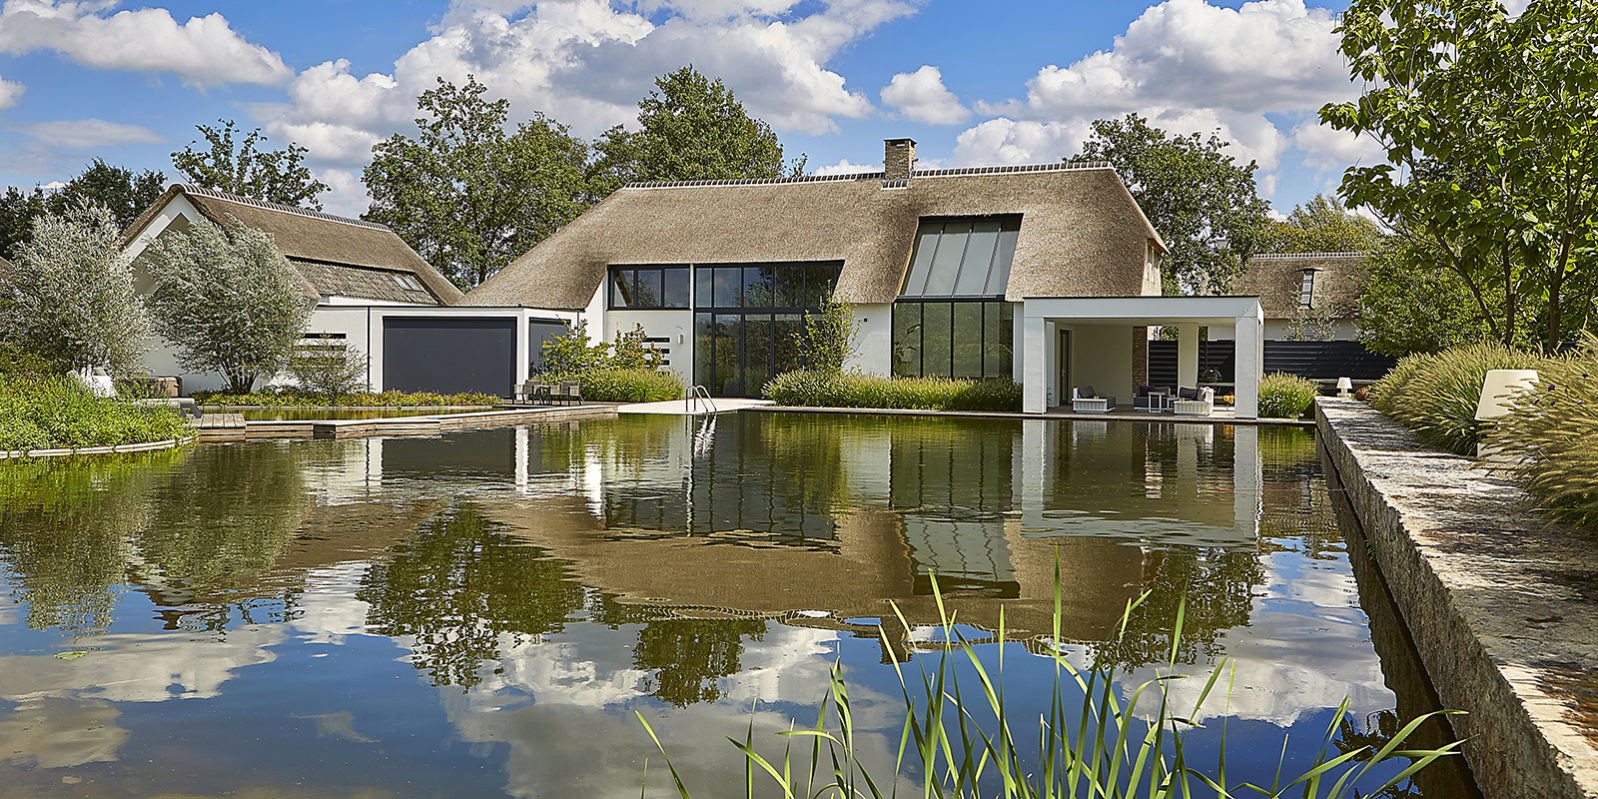 Luxe boerderij interieur, Diane Interieurontwerp, B-TOO, Achterzijde, Modern, Strak, Zwemvijver